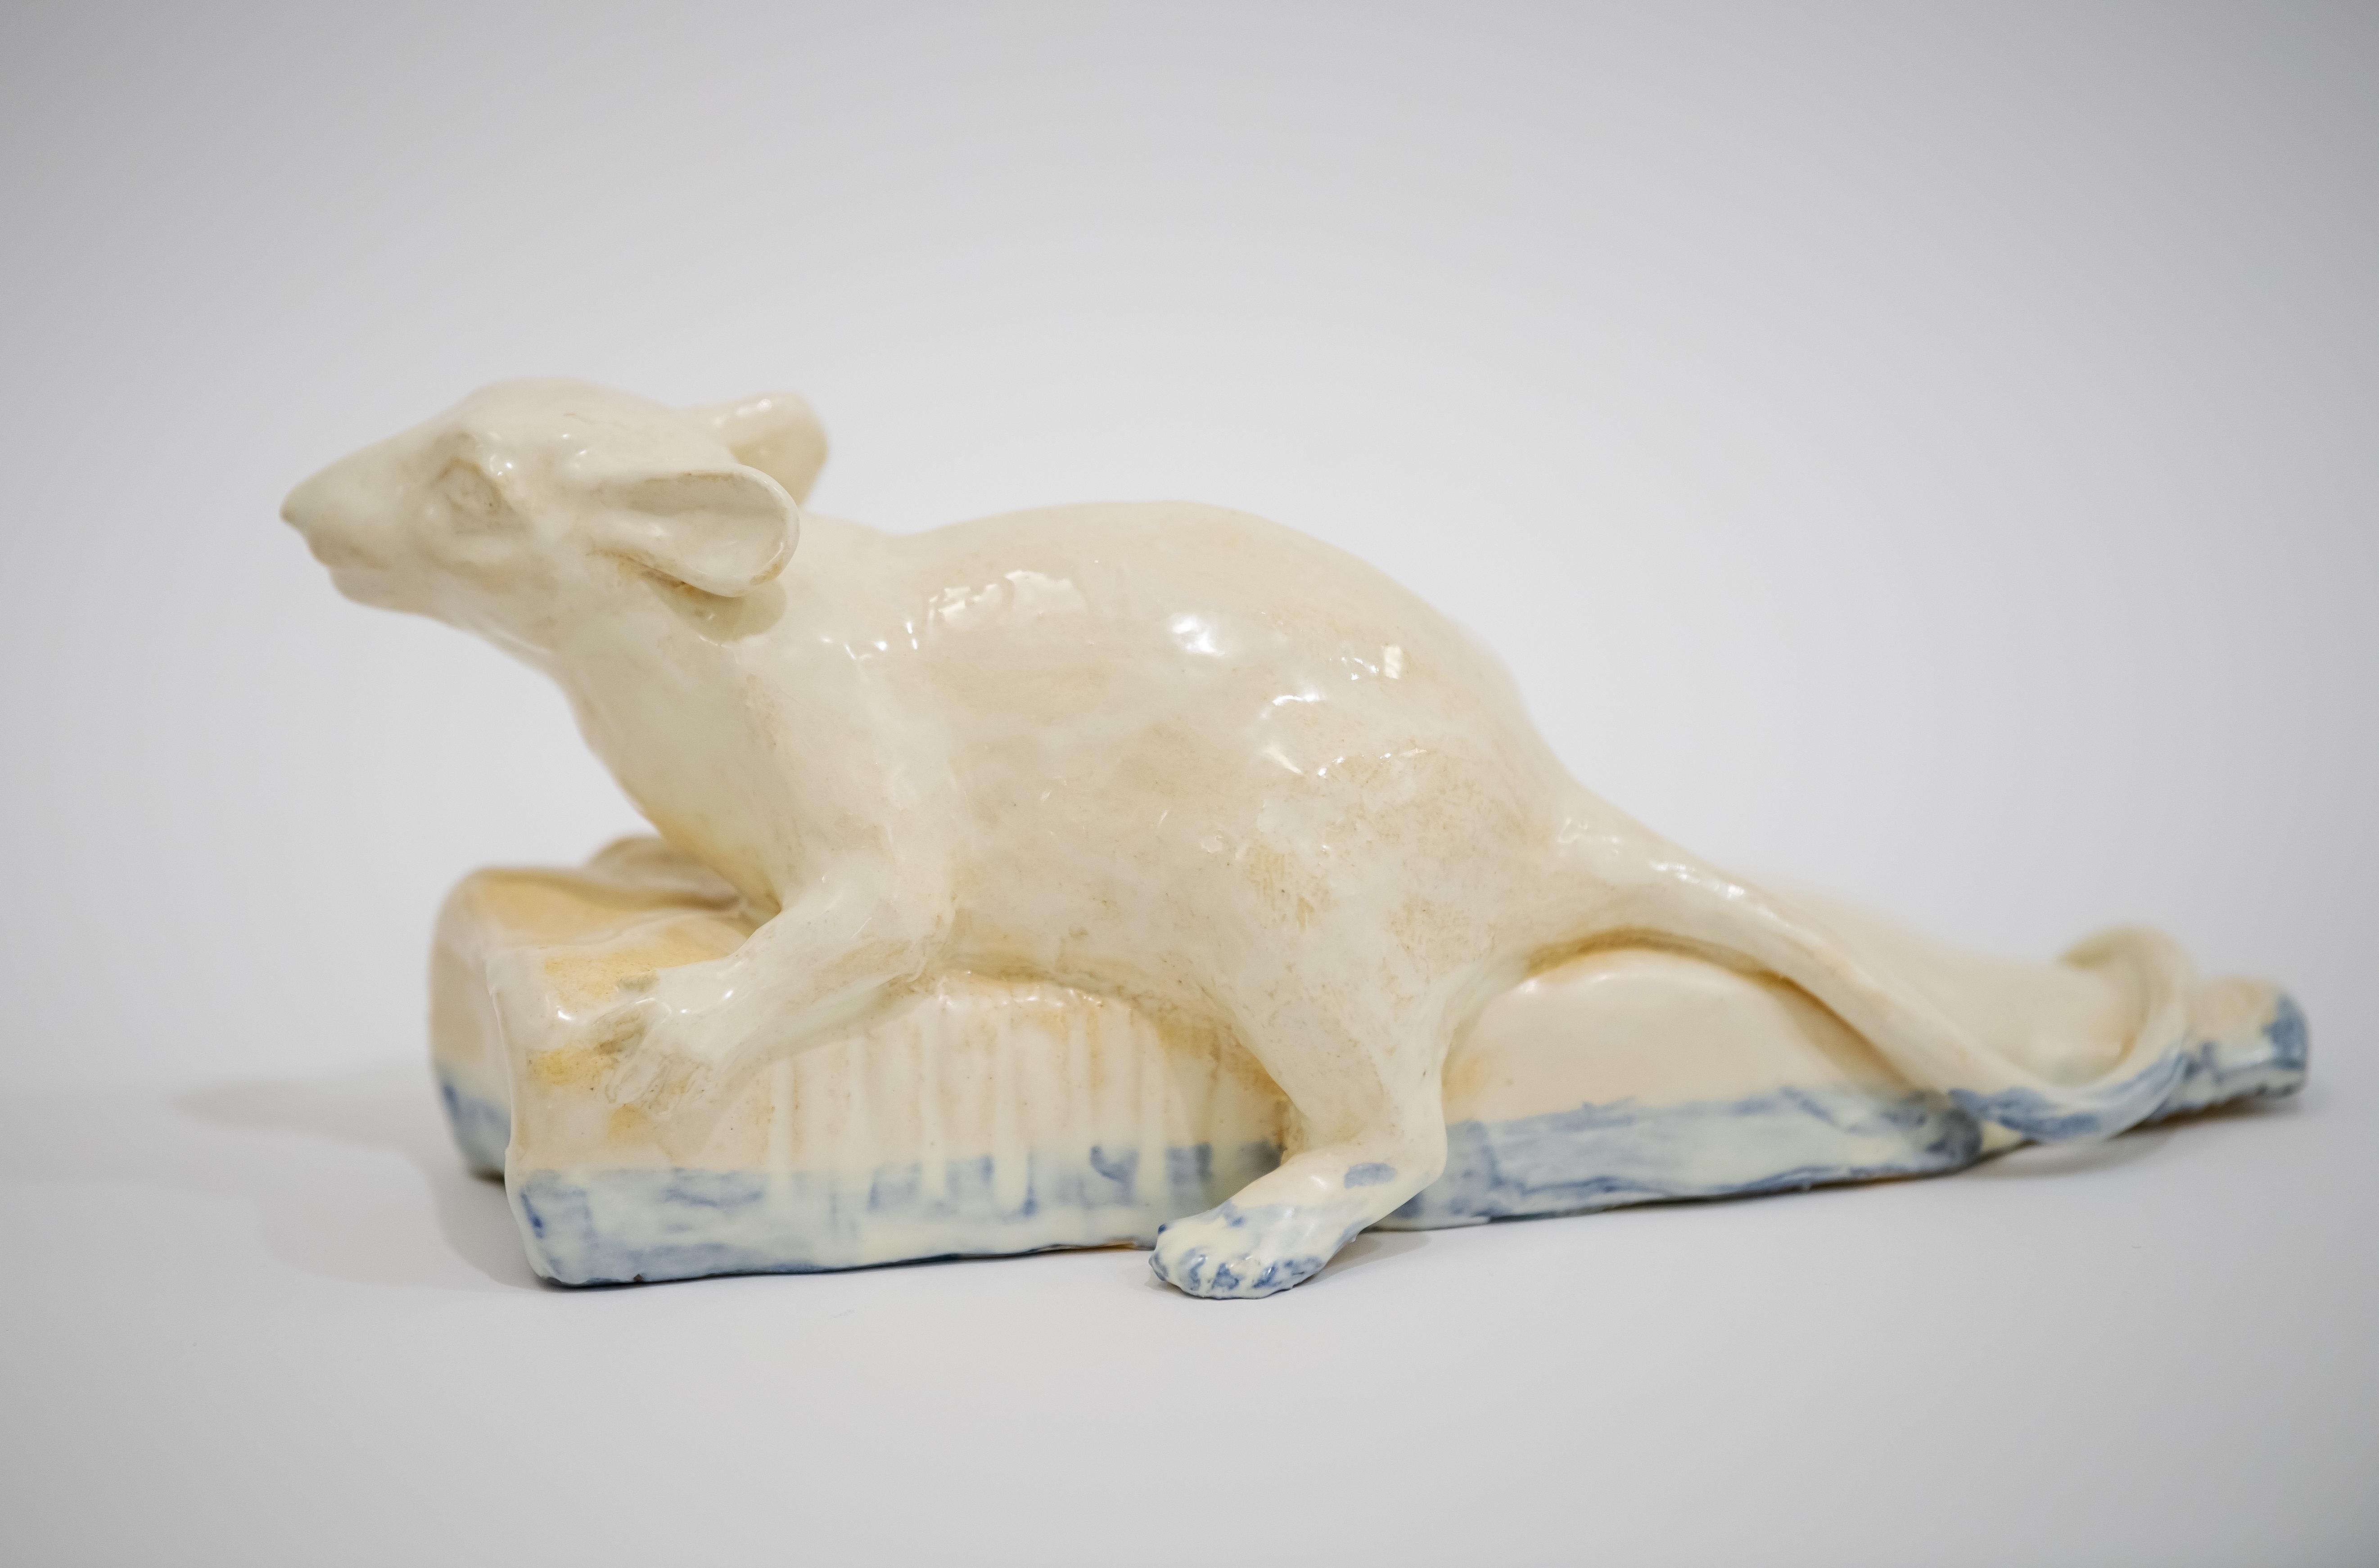 Rat On The Bottle In Water - Unique Handmade Glazed Ceramics Sculpture, Portrait